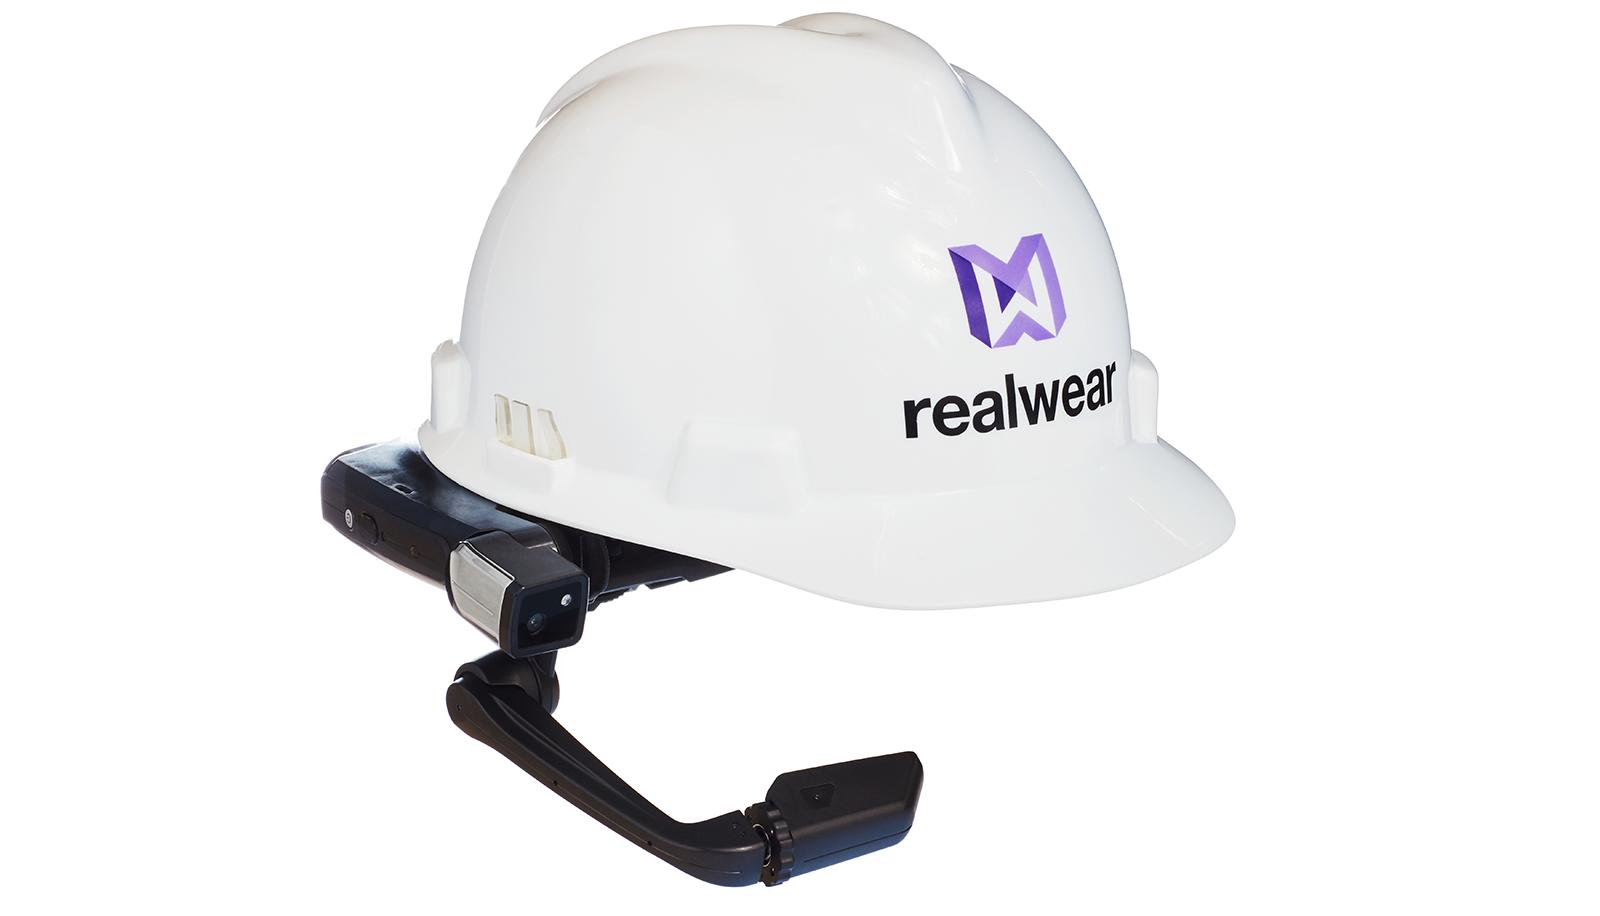 RealWear ヘルメットの画像。